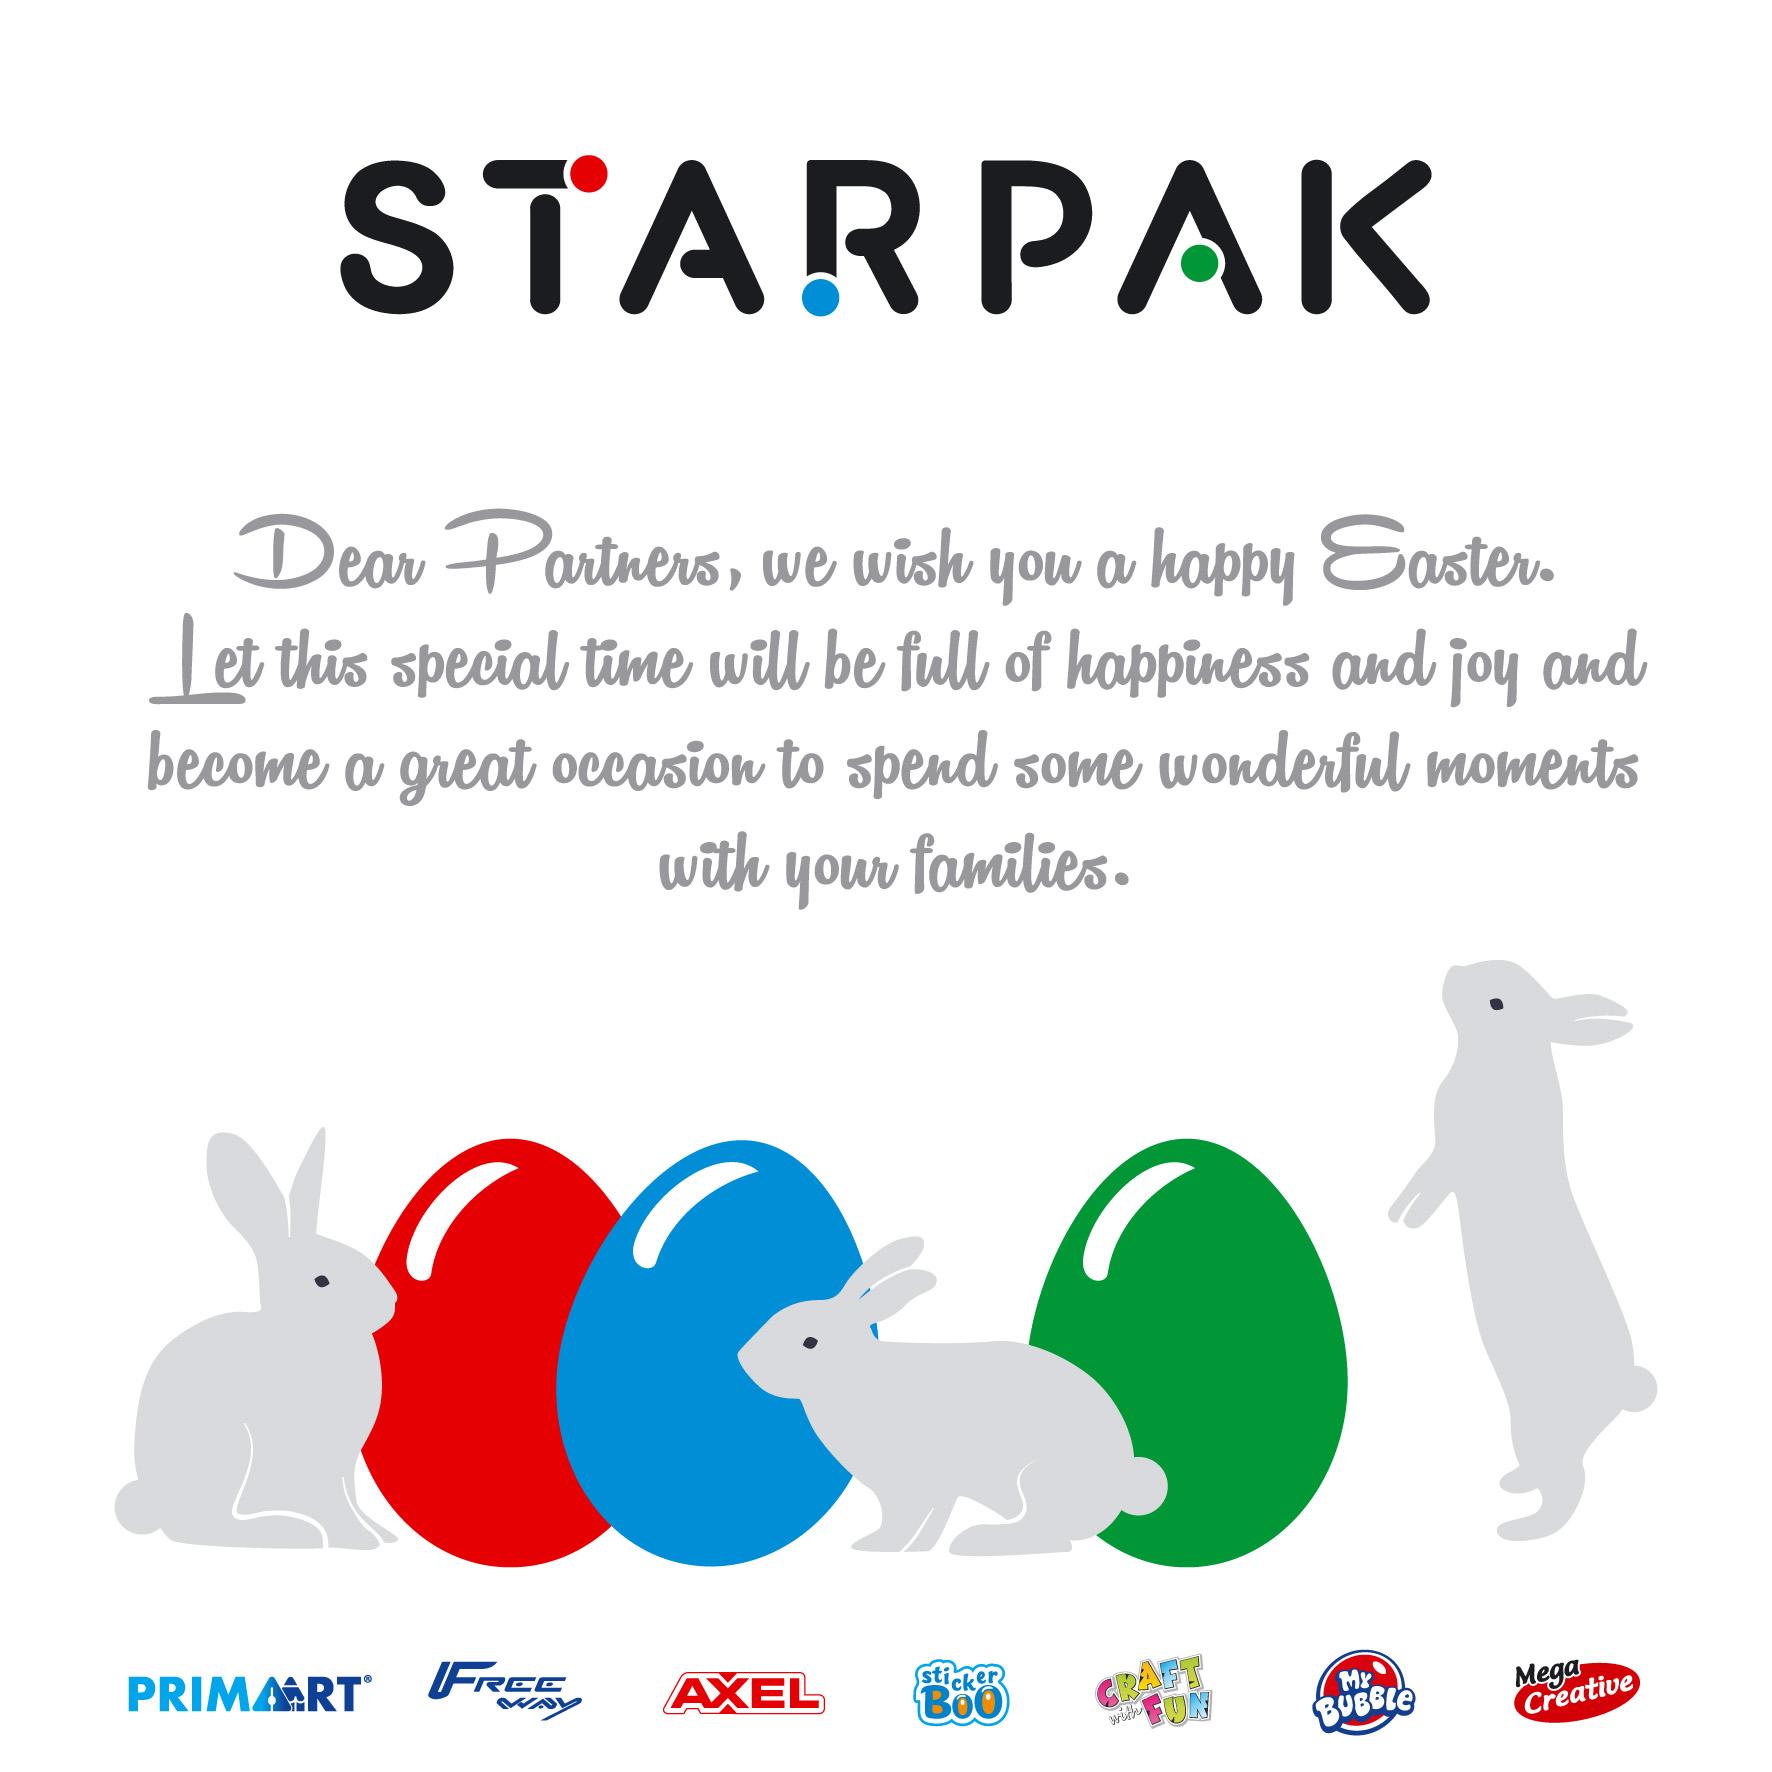 STARPAK Happy Easter 2016